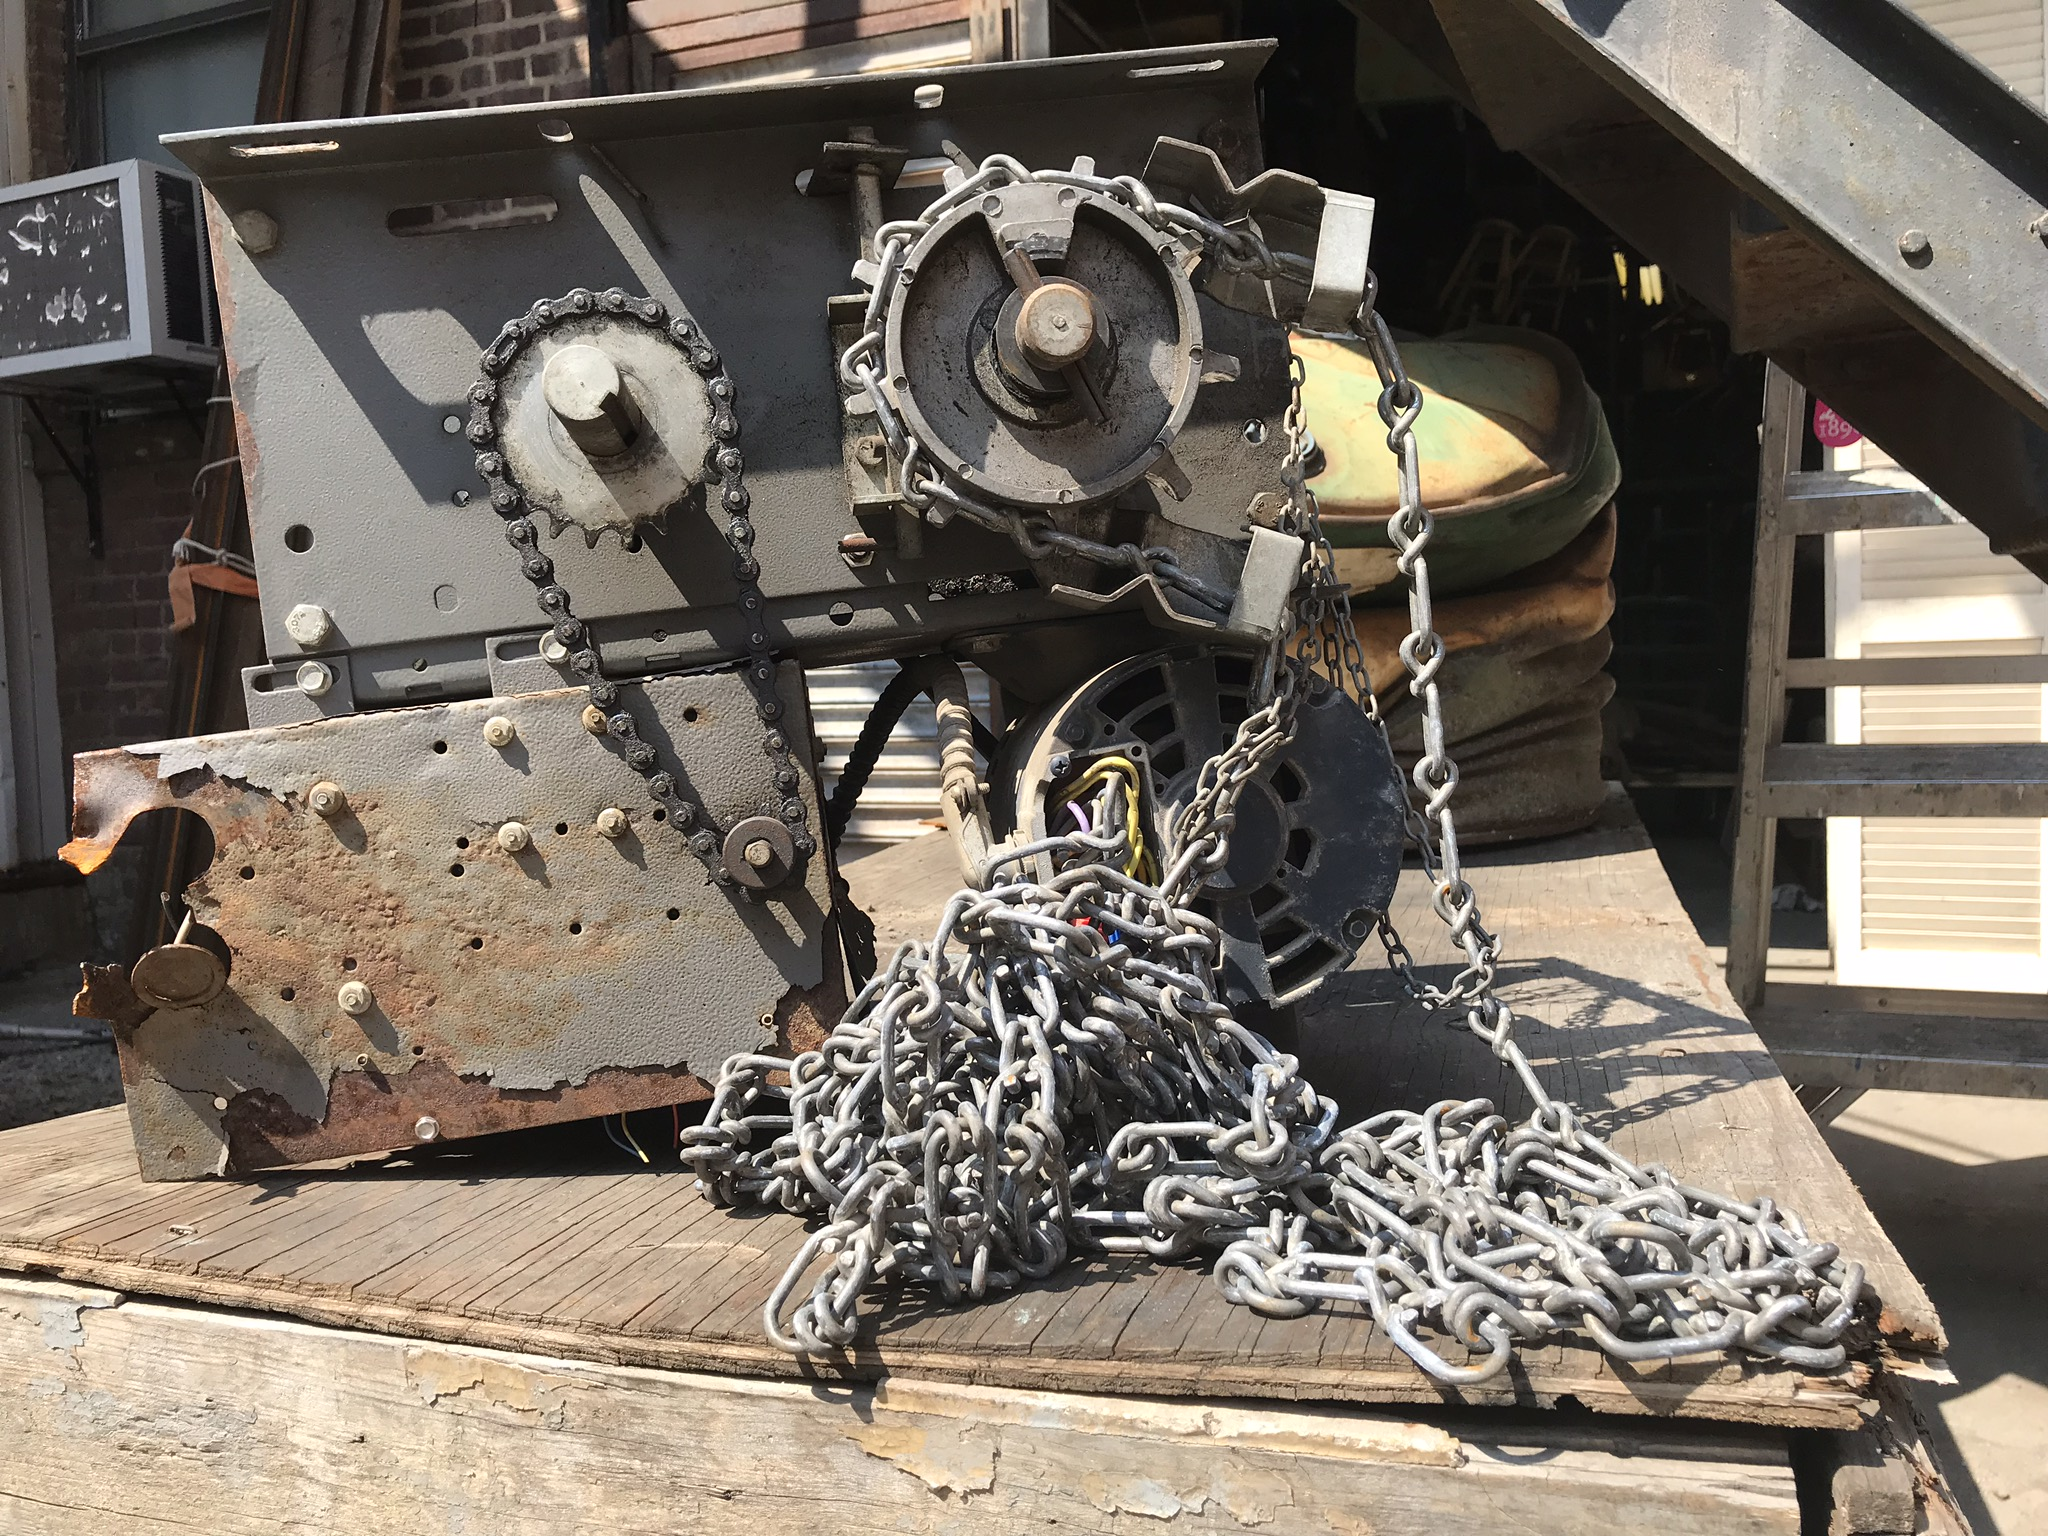 machine part with chain $60